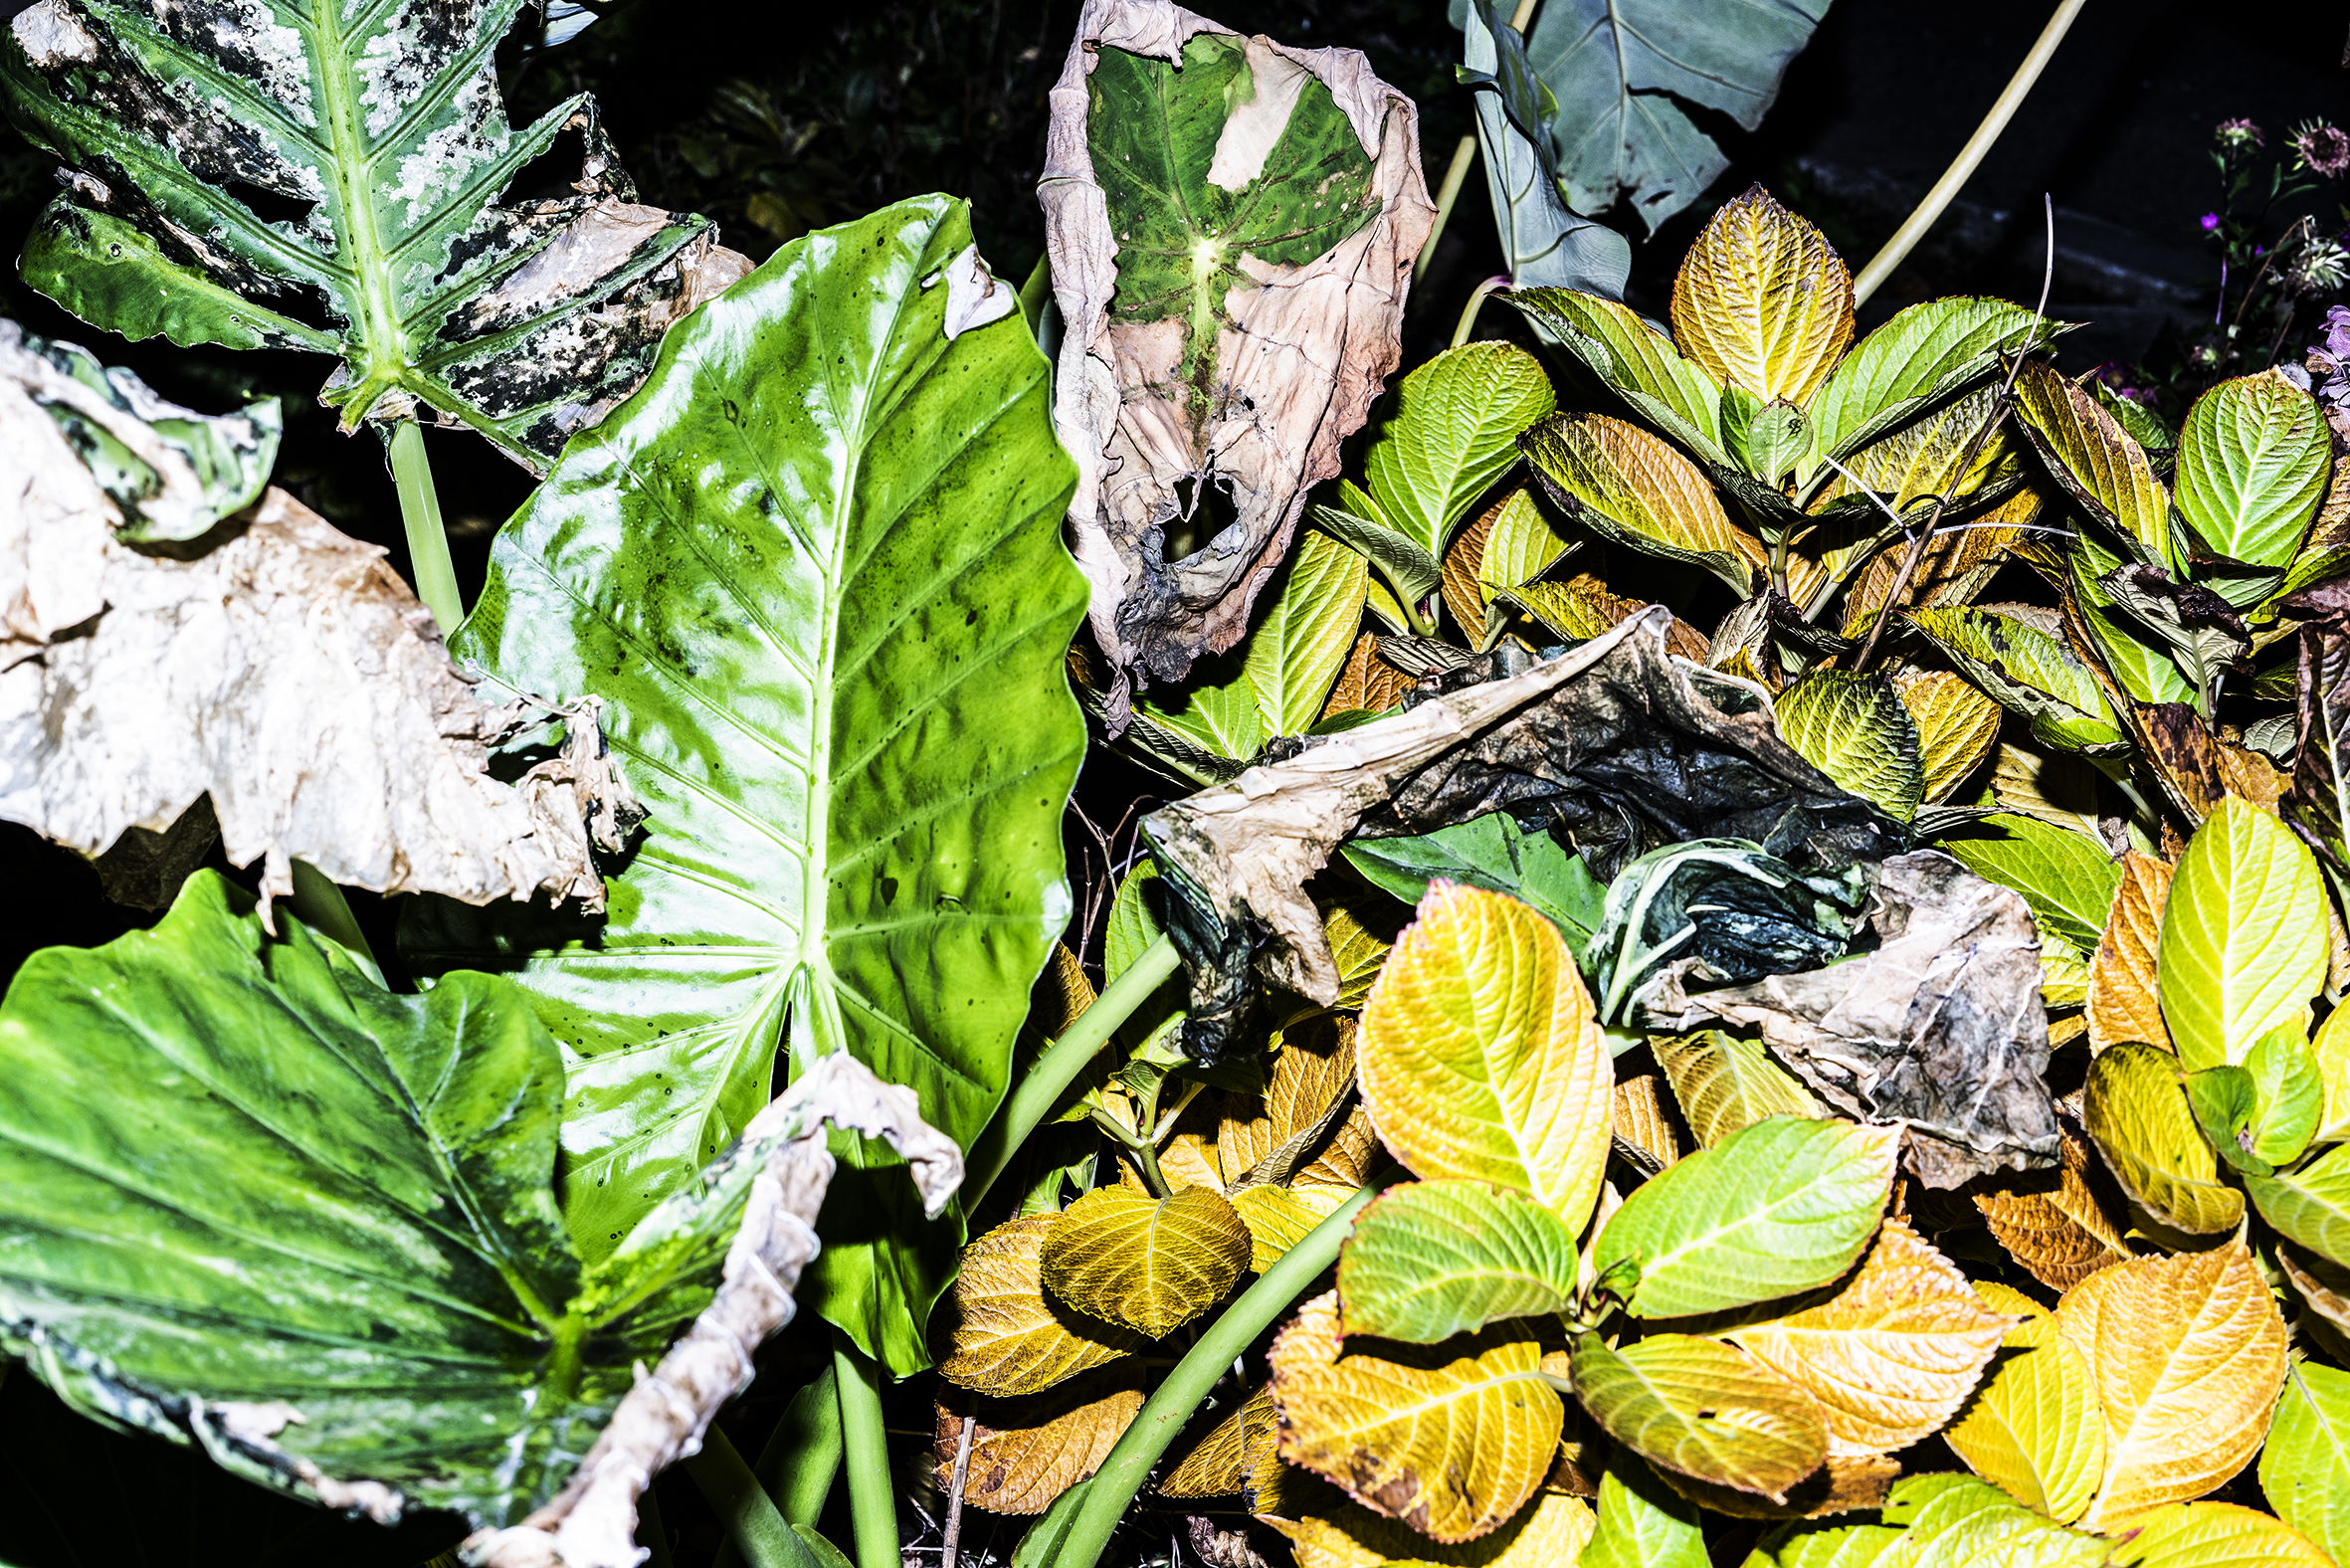 DEAD_PLANT.jpg